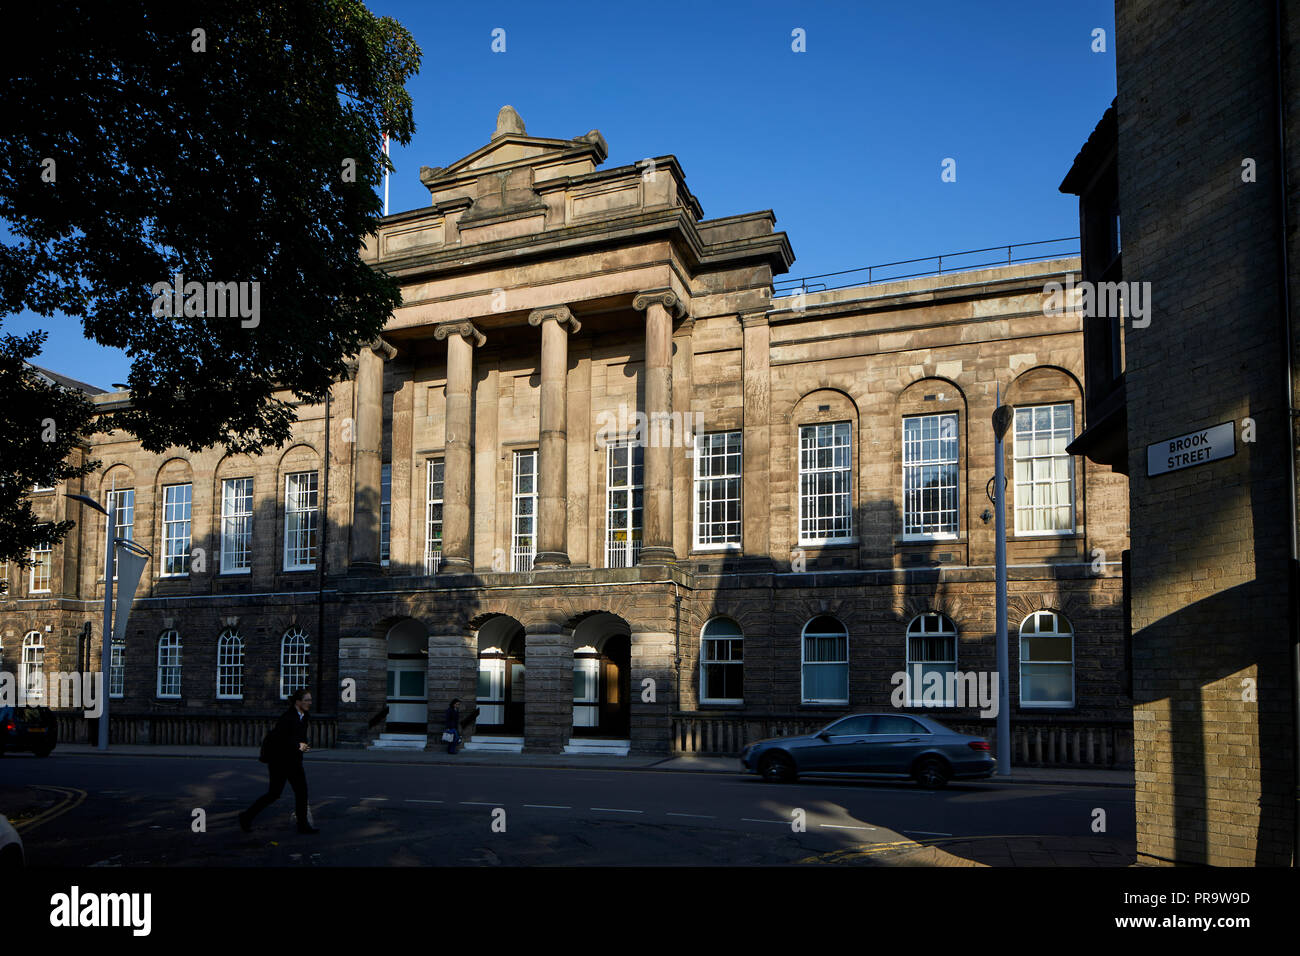 Landmark sandstone Stoke Town Hall, Stoke-on-Trent, Staffordshire by architect Henry Ward - Stock Image